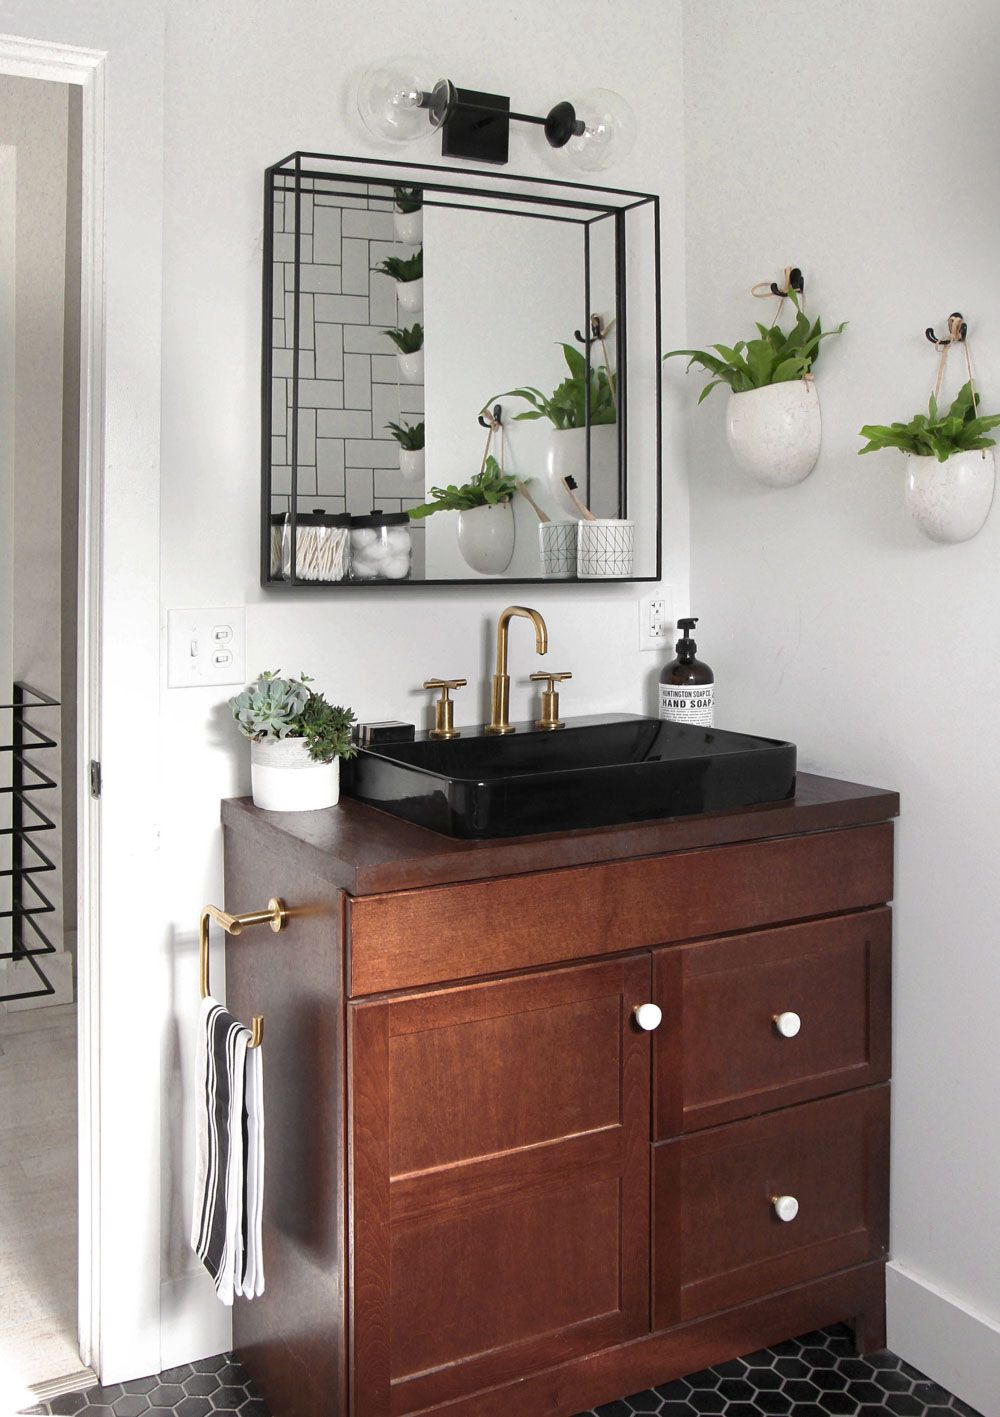 Mirror w/ shelf | Target Project 62 | Bathrooms. | Pinterest | Bath ...